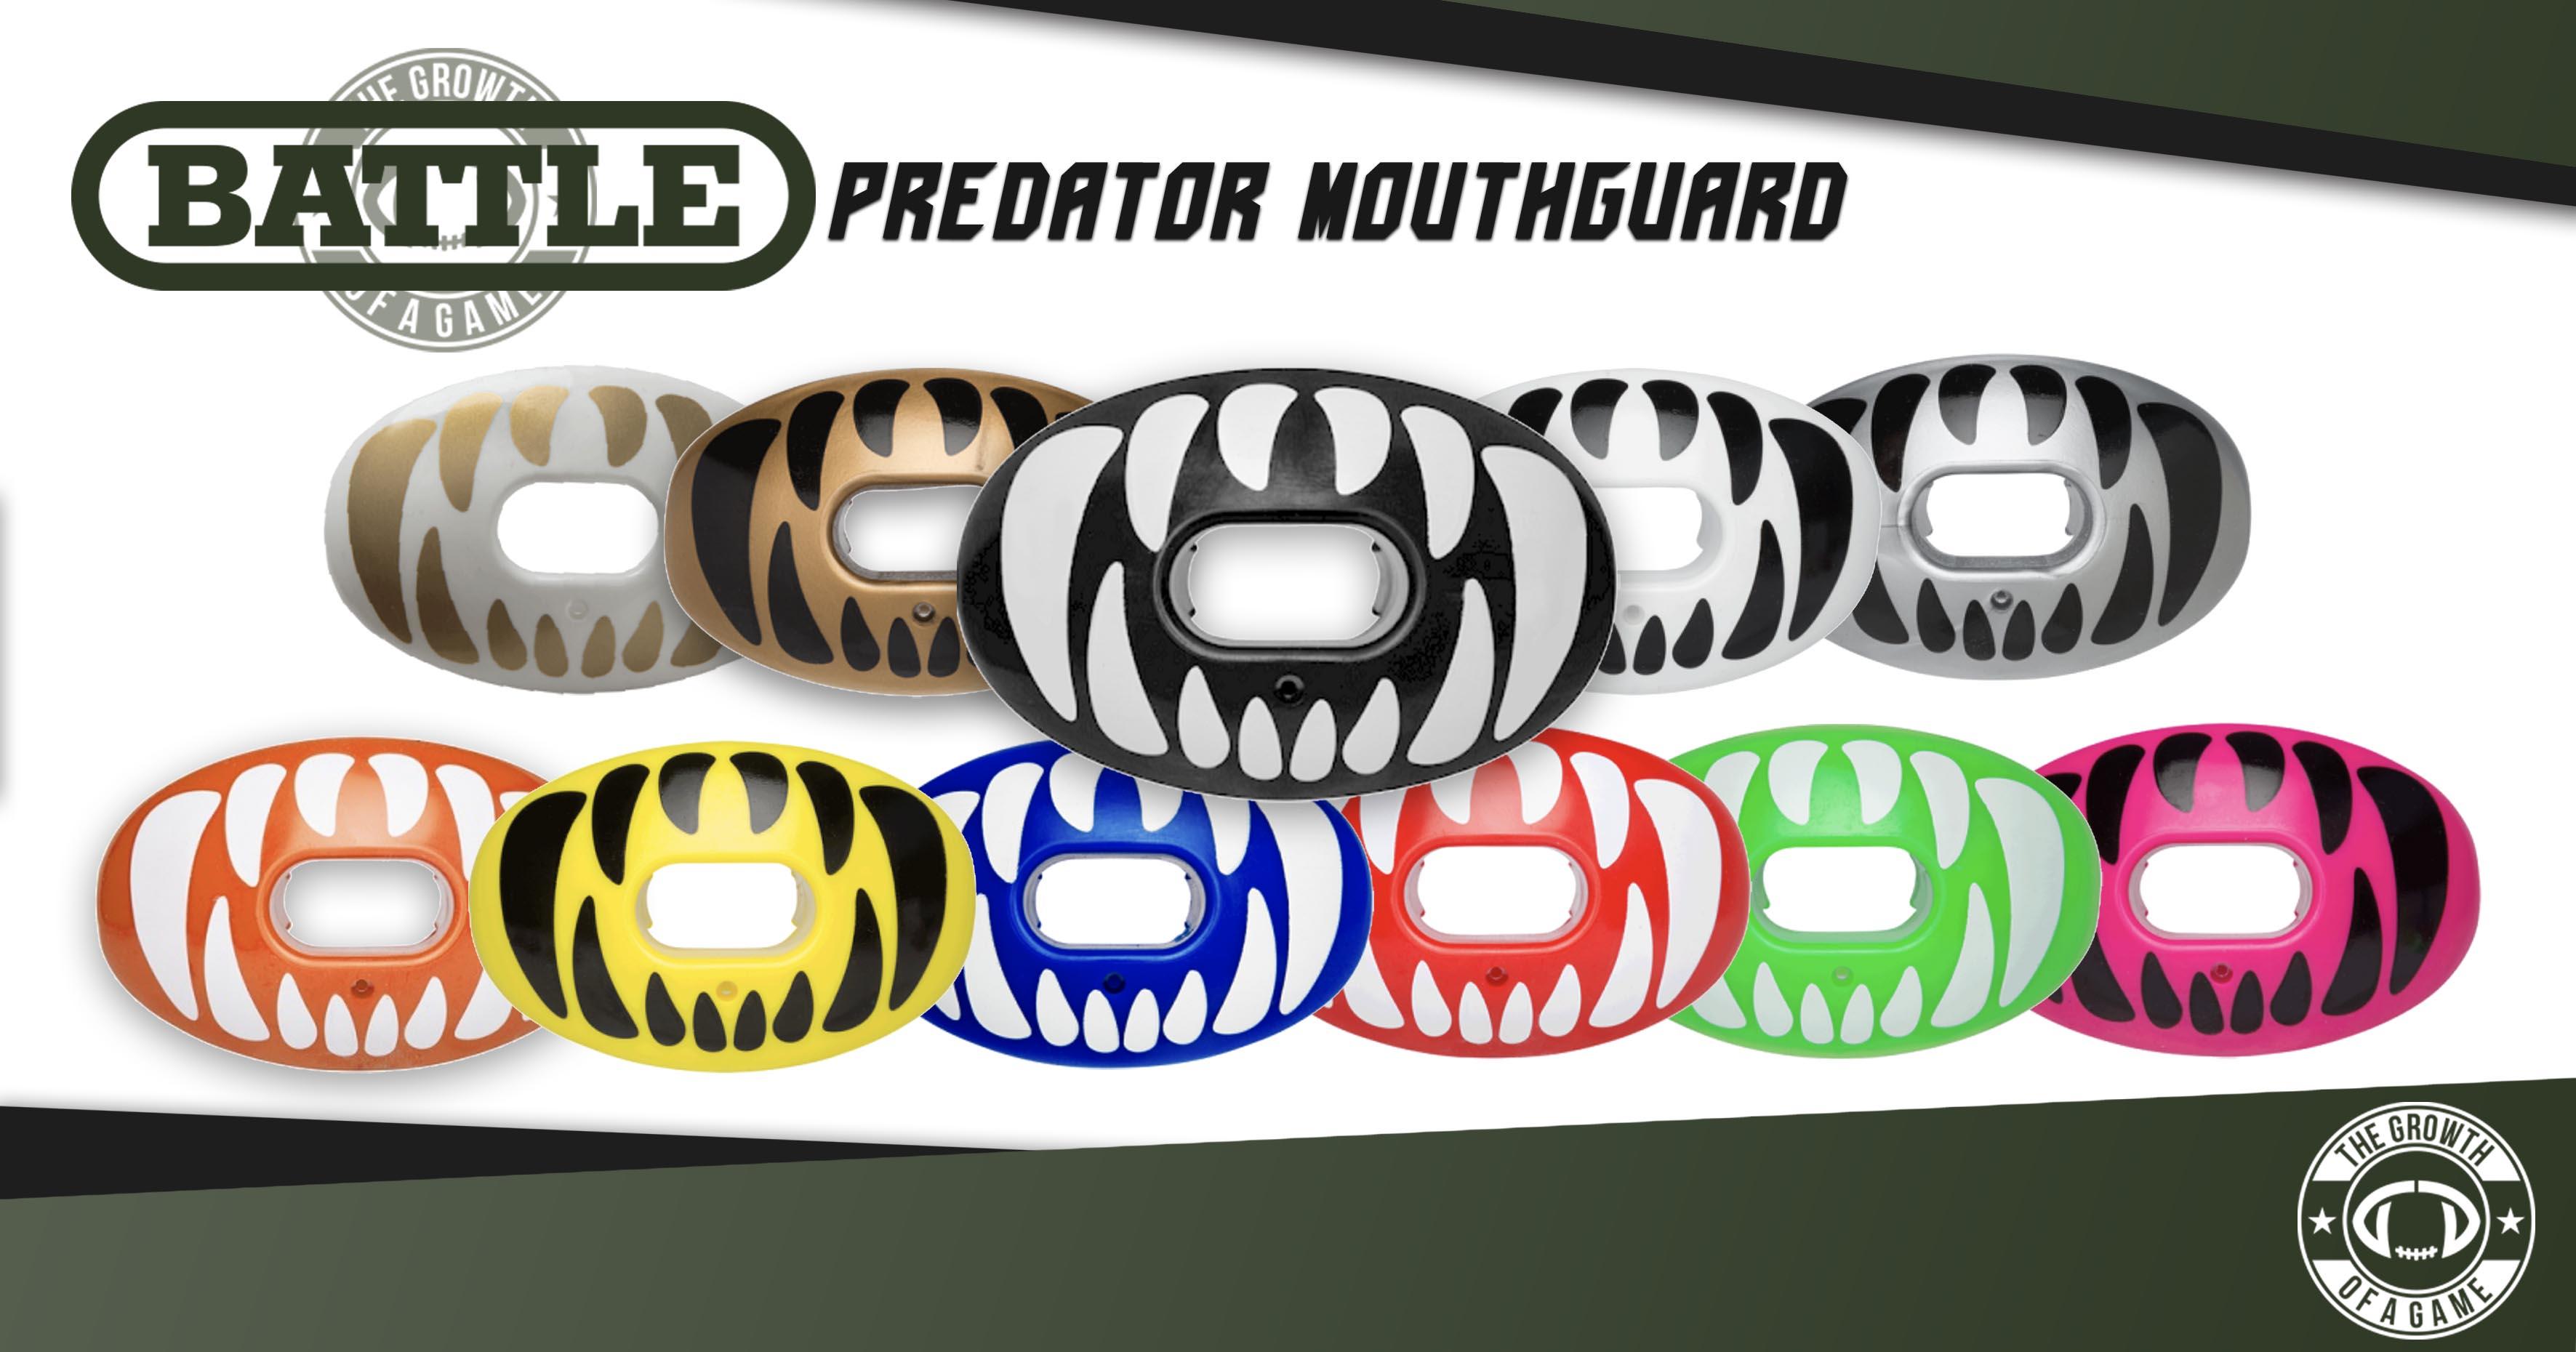 Battle Oxygen Predator Mouth Guard Graphic 1